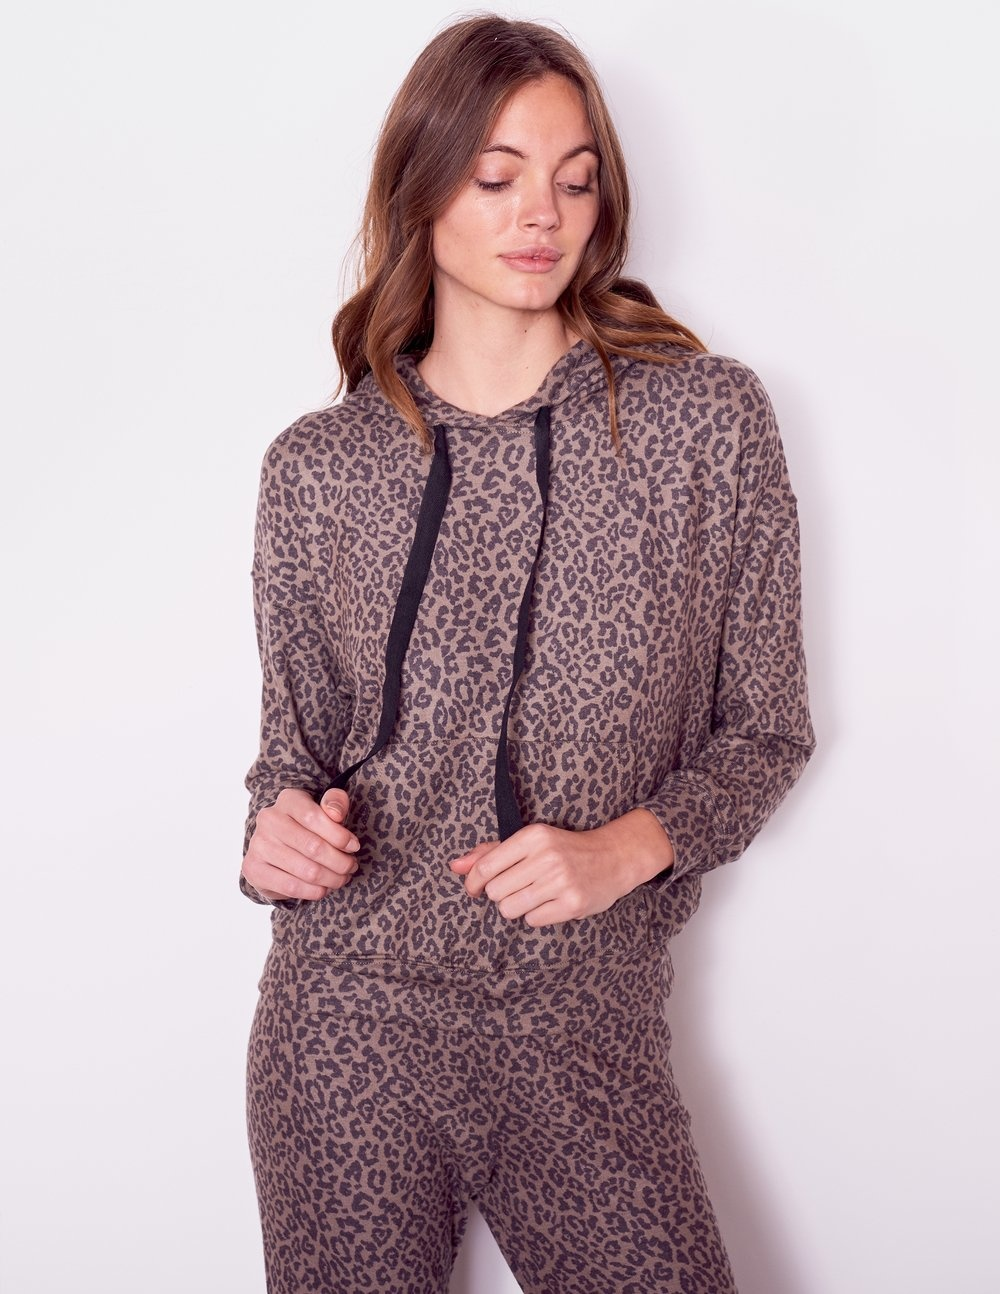 Sundry Sundry Leopard Hoodie